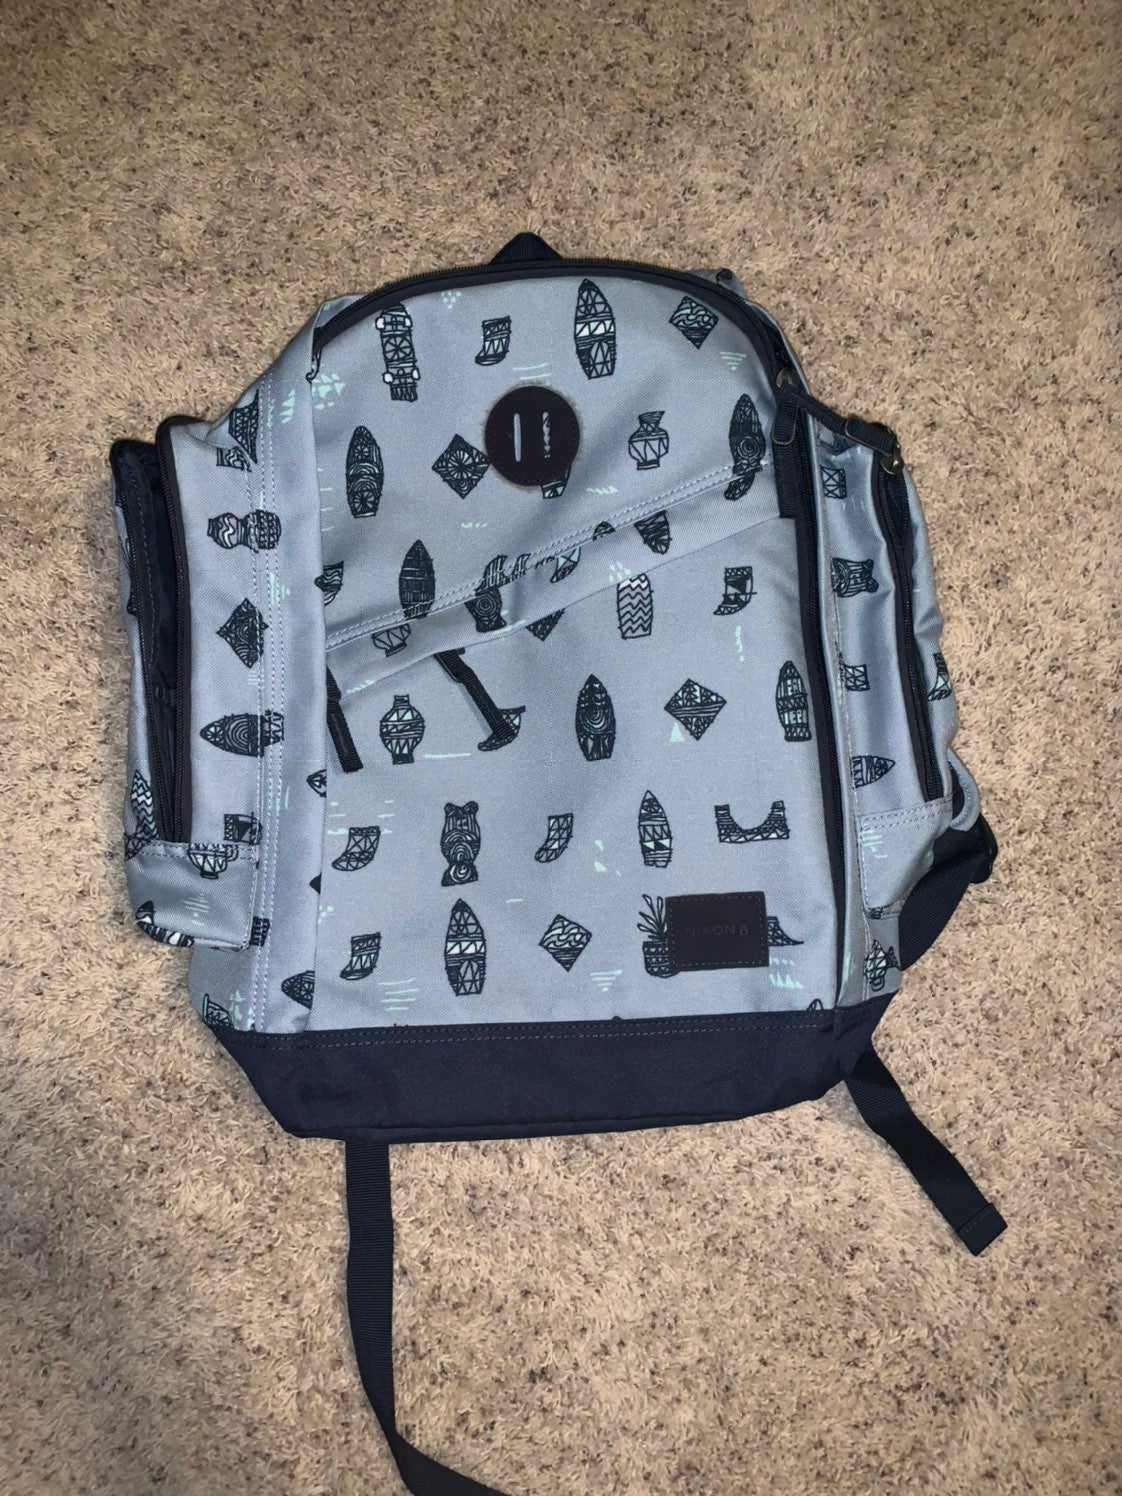 Nixon watch backpack